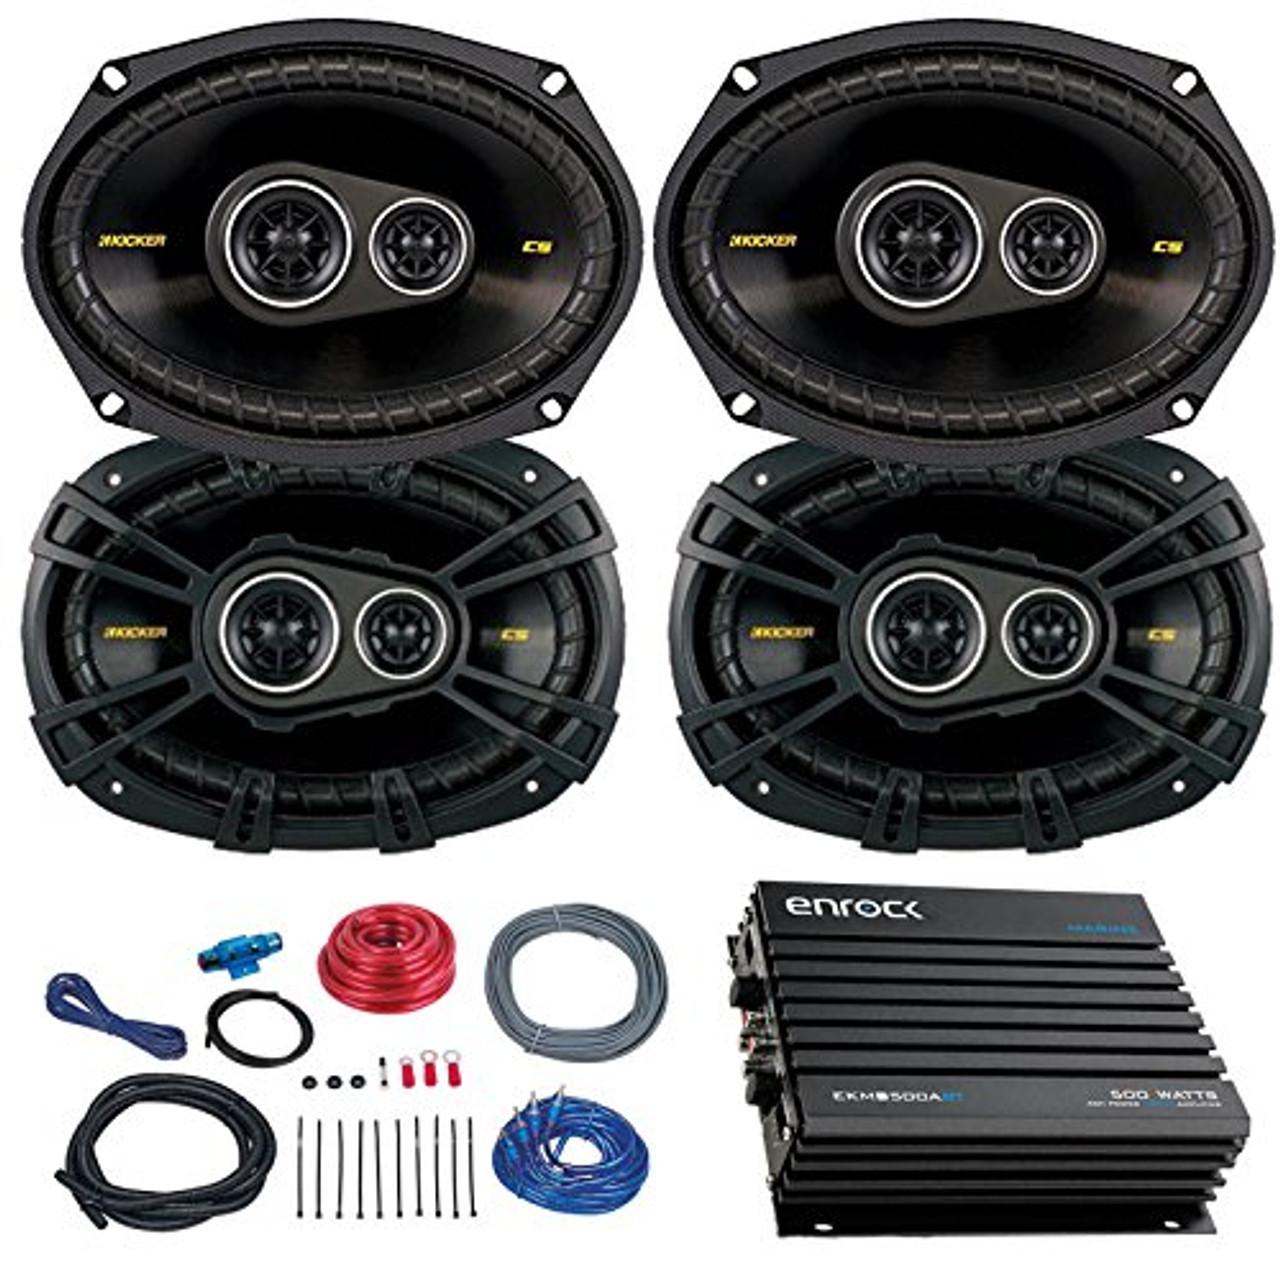 small resolution of car speaker set with amplifier 4 kicker cs6934 6x9 inch 900 watt 4 ohm